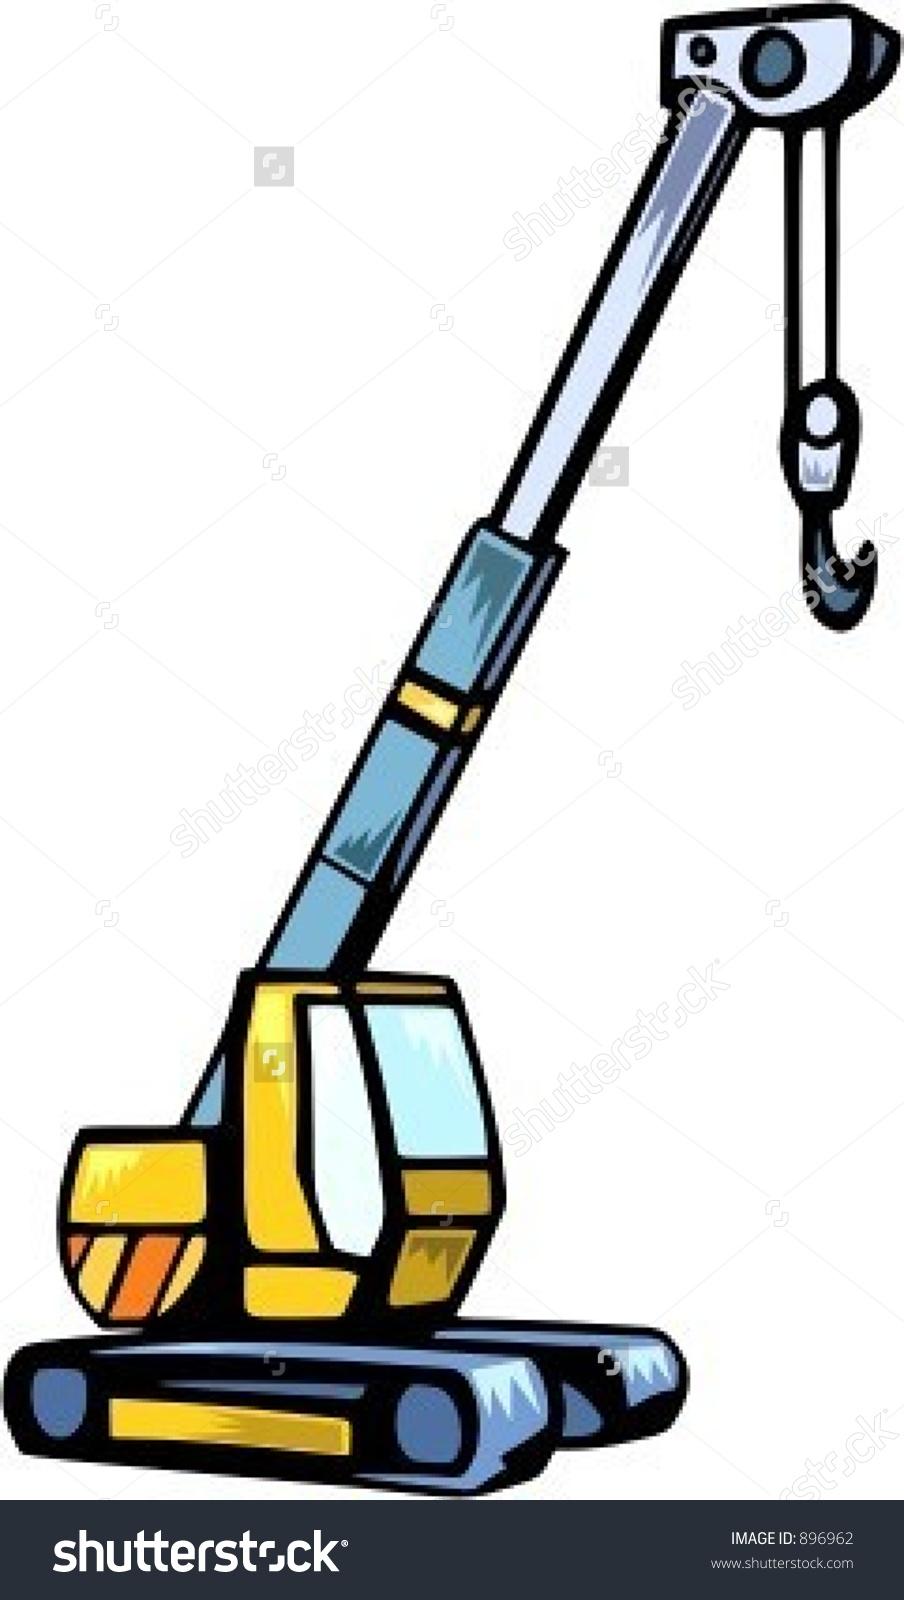 Truck with Crane Clip Art.